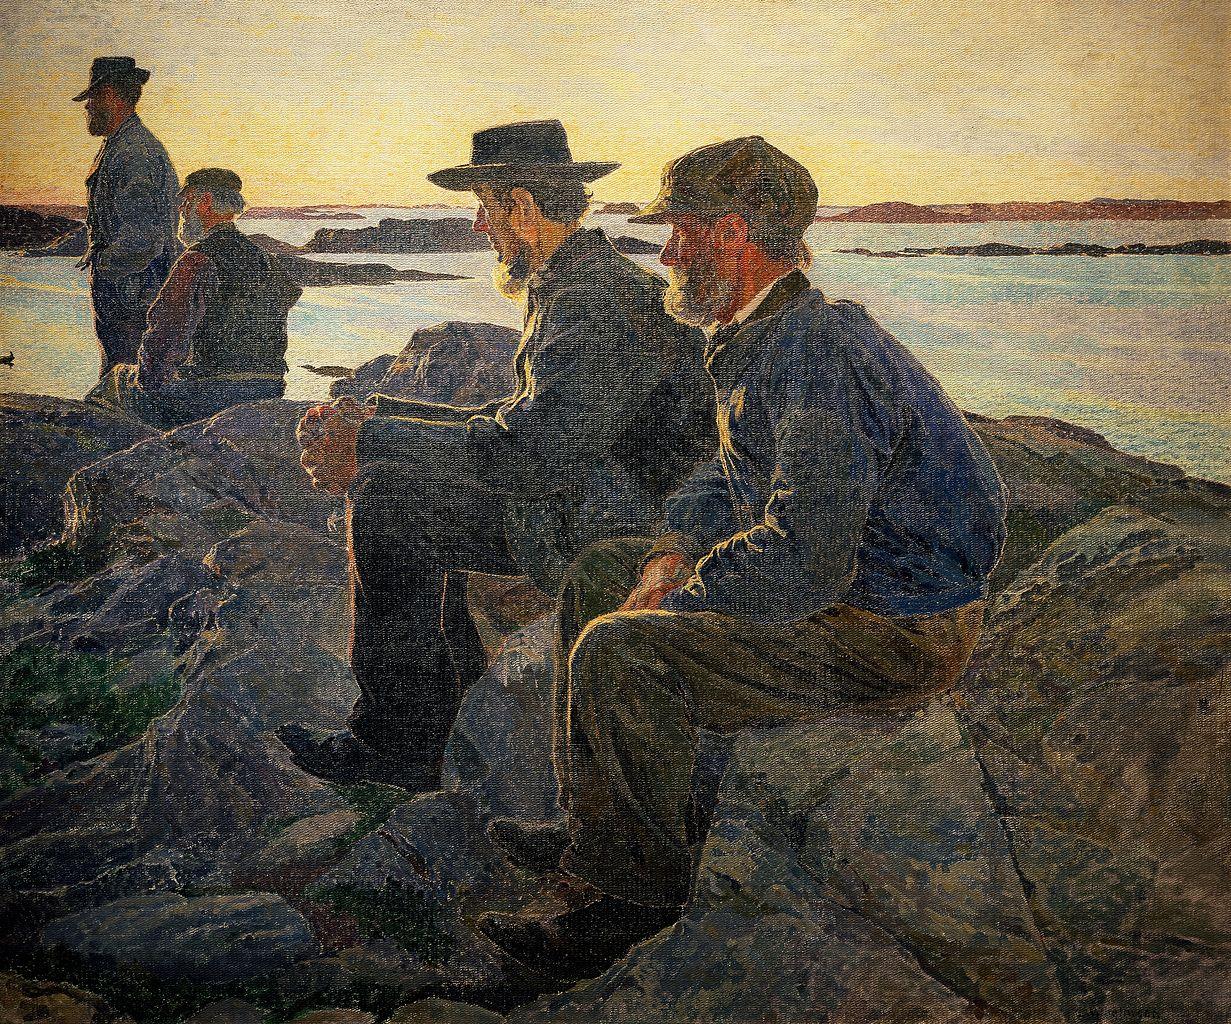 1231px-Carl_Wilhelm_Wilhelmson_-_On_Rocks_at_Fiskebackskil